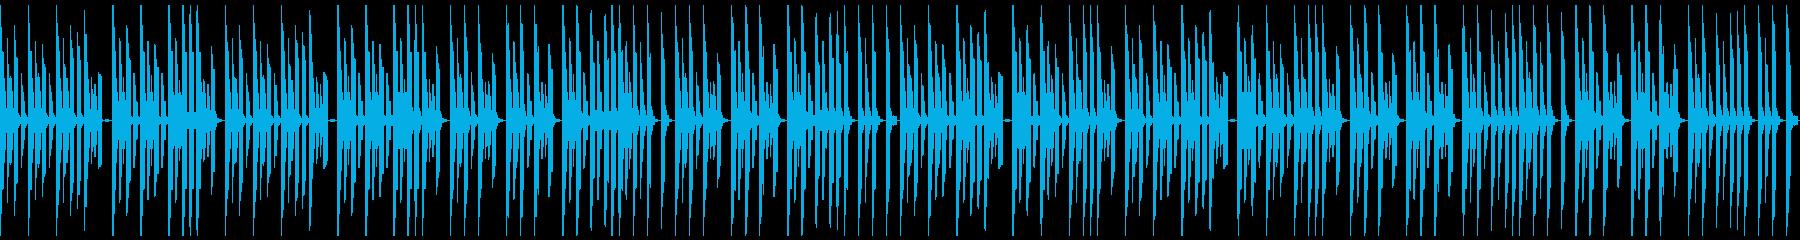 FC風ループ あれからの再生済みの波形